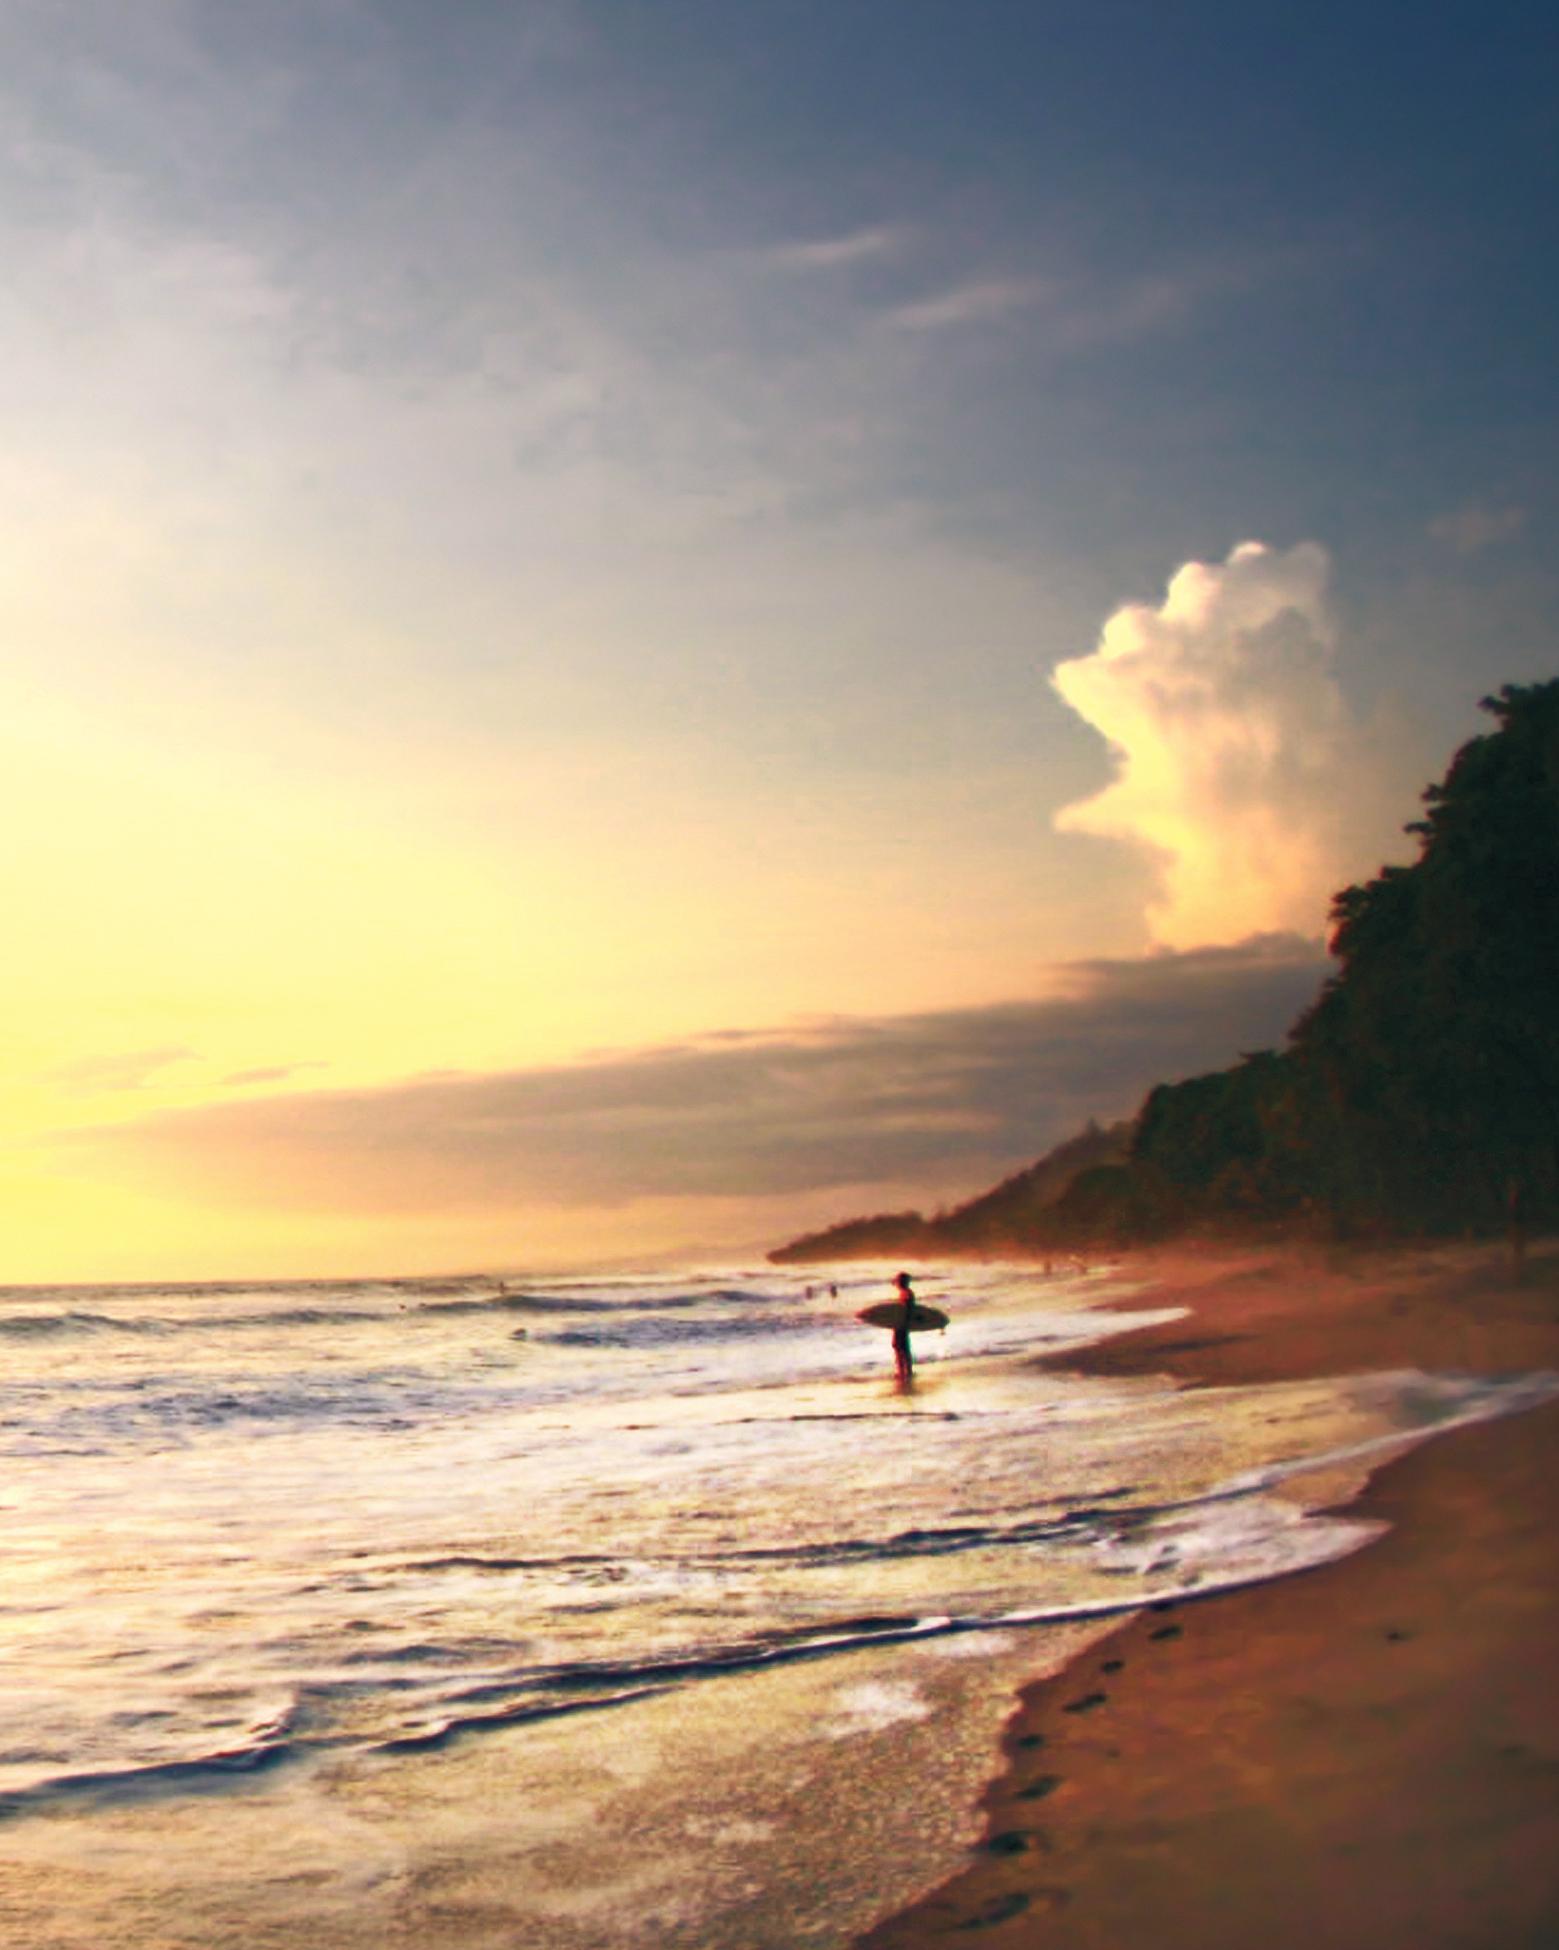 beach-sunsnet-surfing-s111598-149410324-medium.jpg